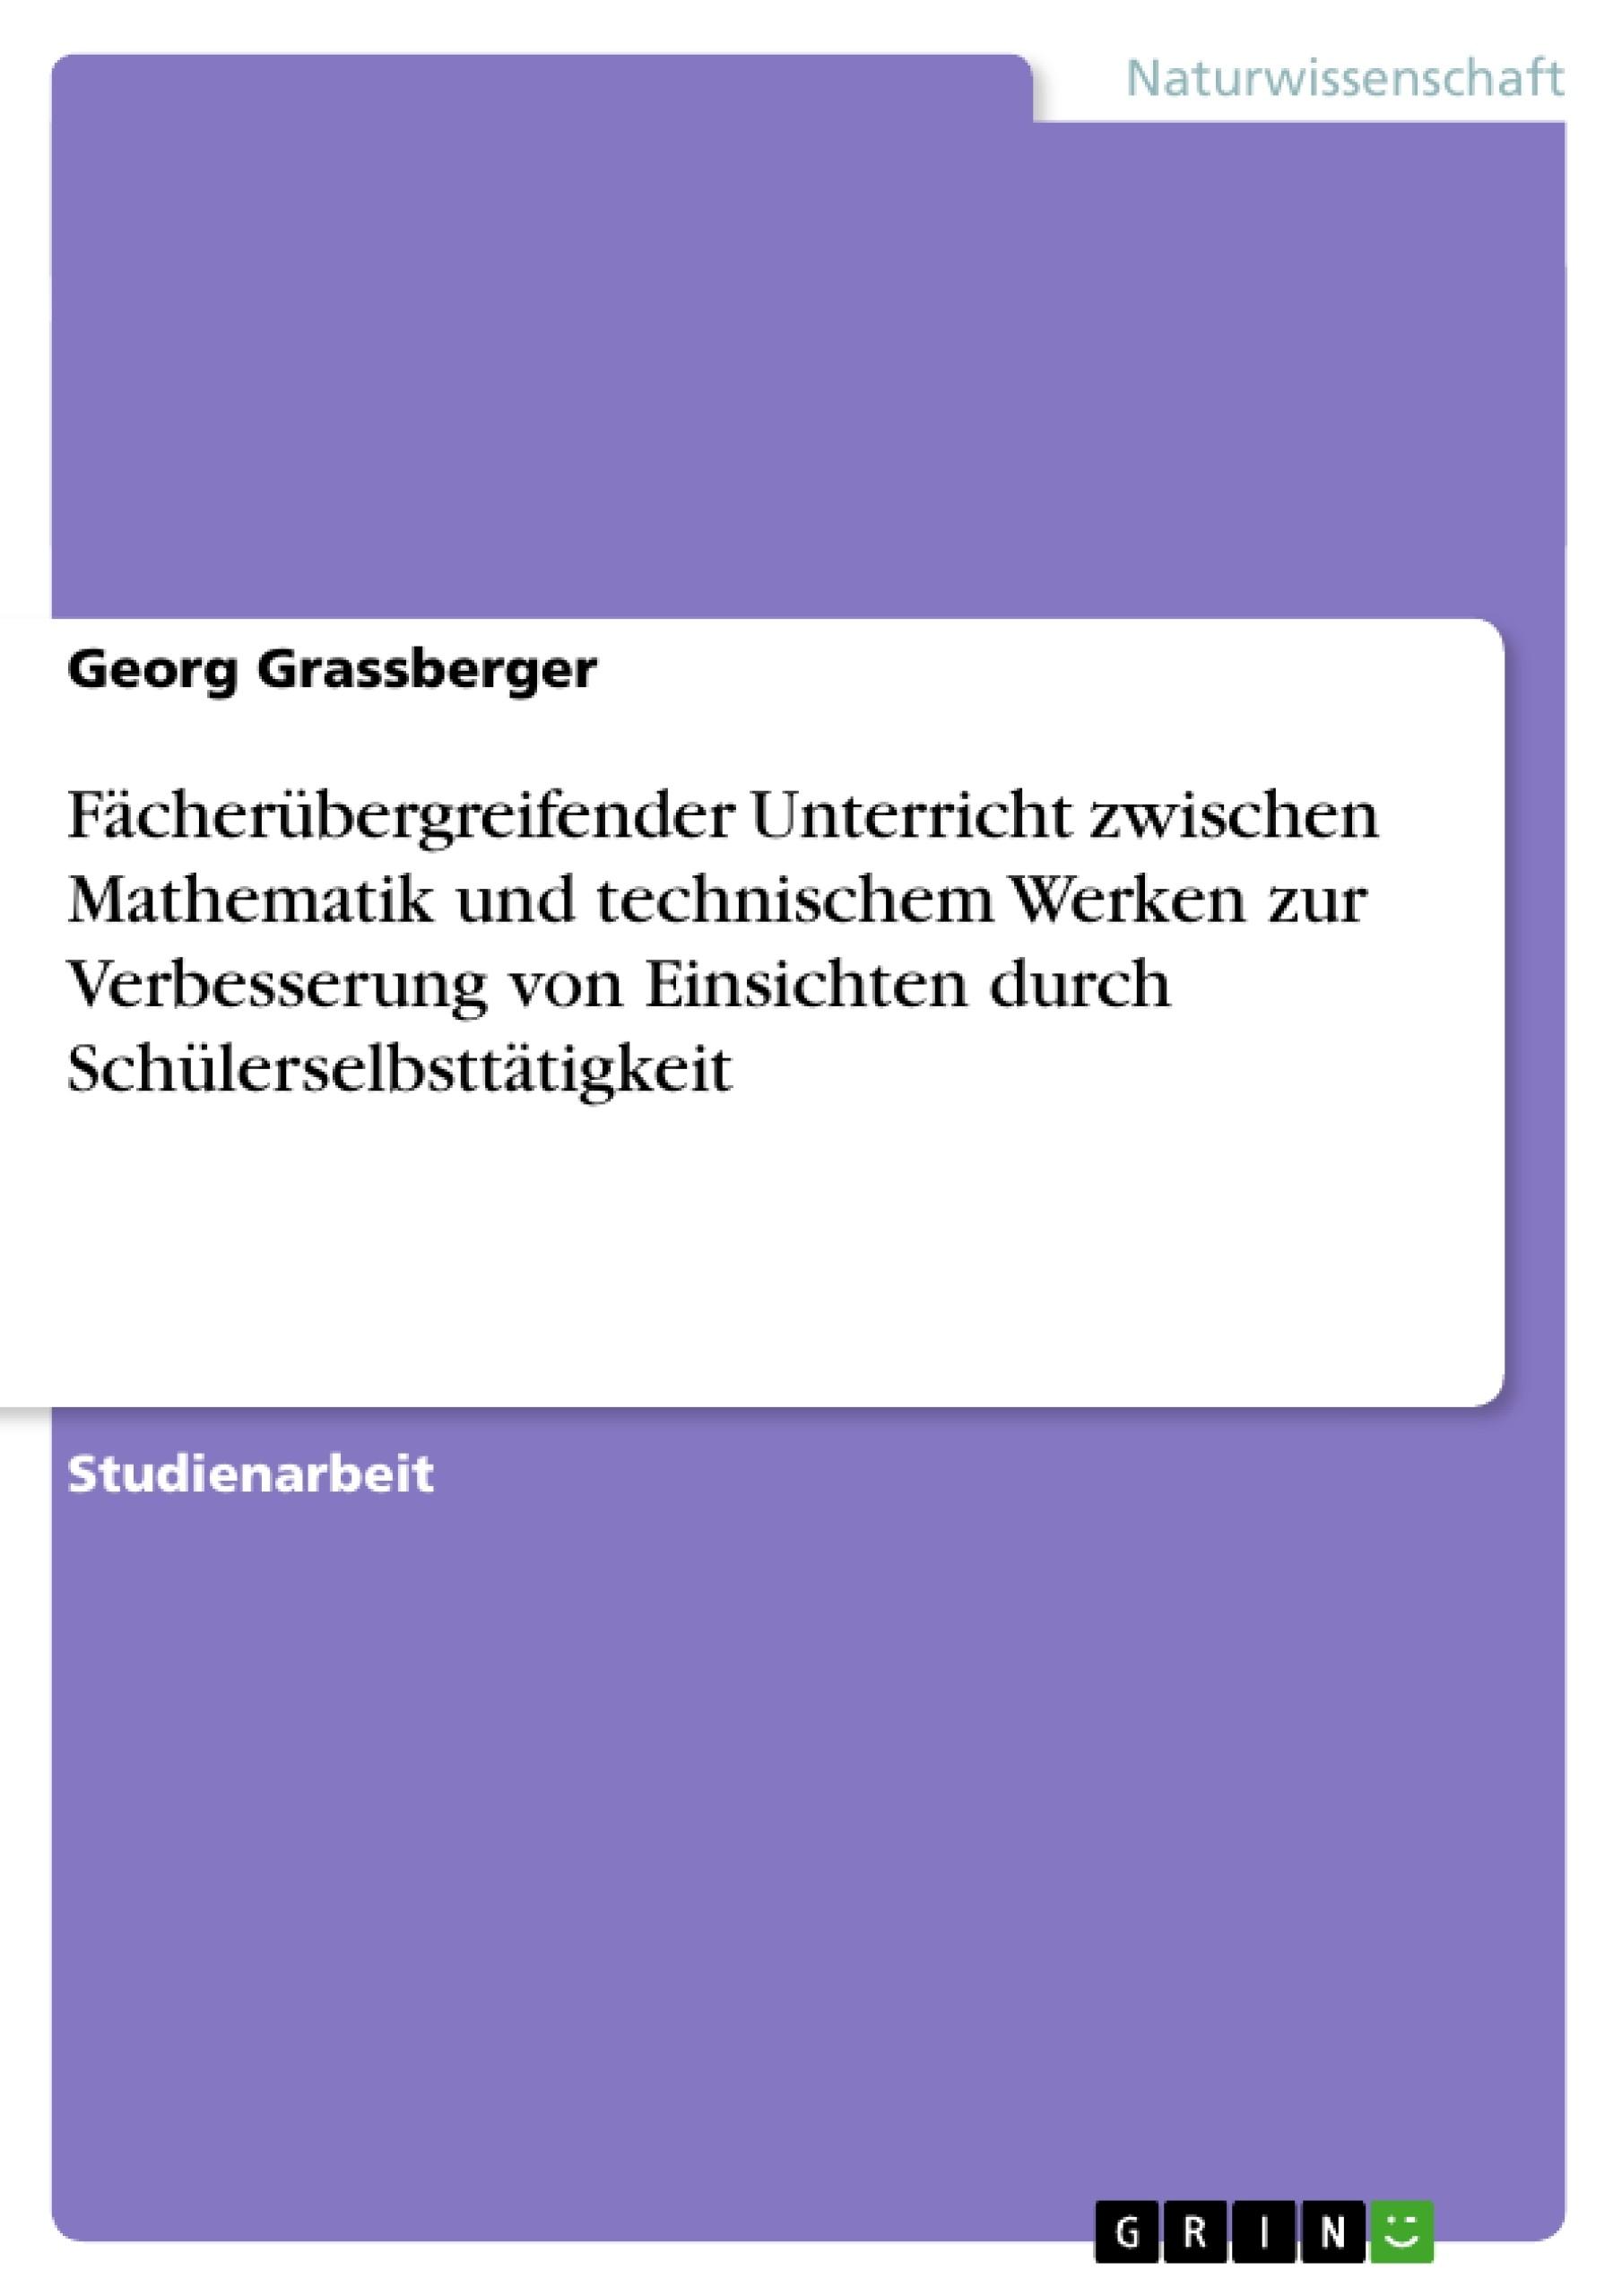 Fancy Quadratwurzel Praxis Arbeitsblatt Photo - Kindergarten ...